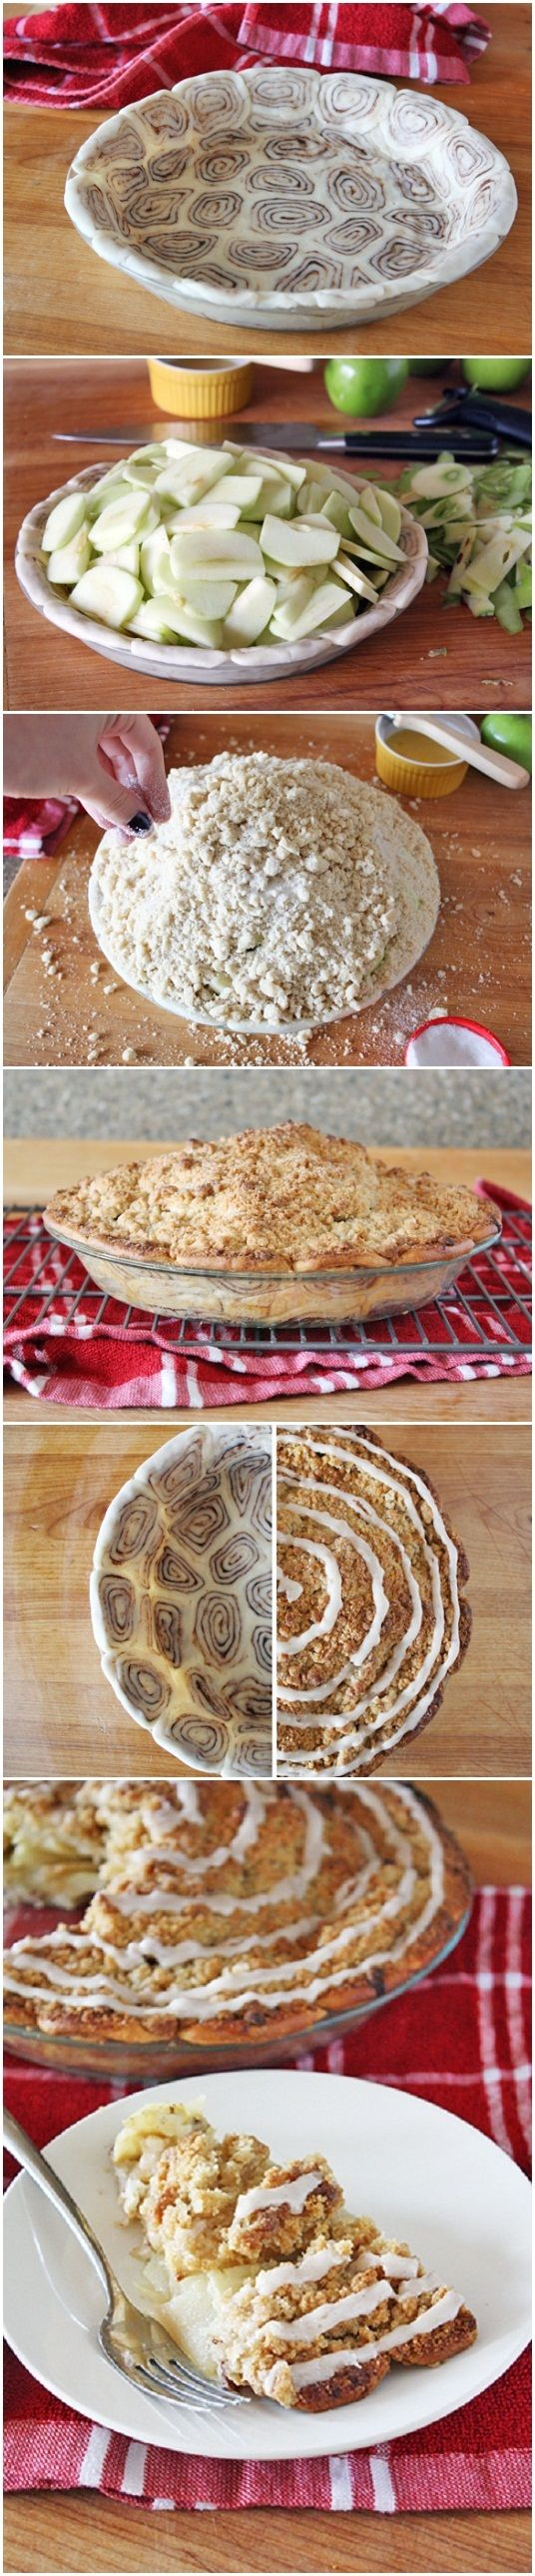 Cinnamon Roll Apple Pie Ive